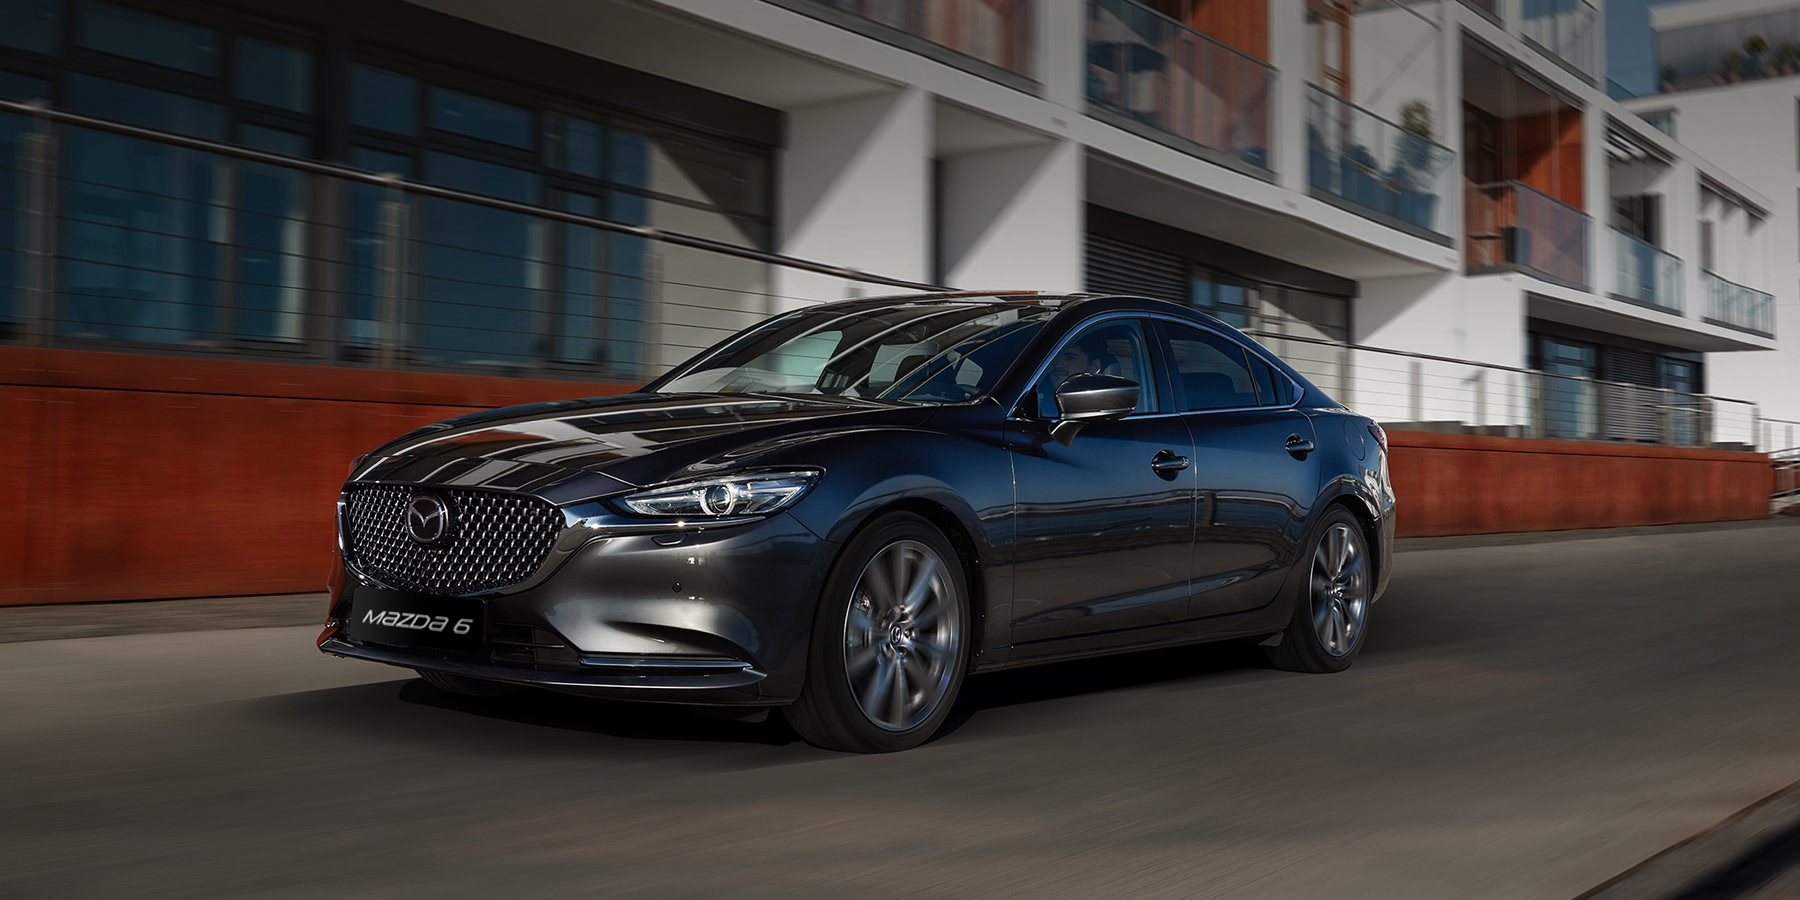 Mazda6 | Executive Saloon Car & Luxury Car | Mazda UK